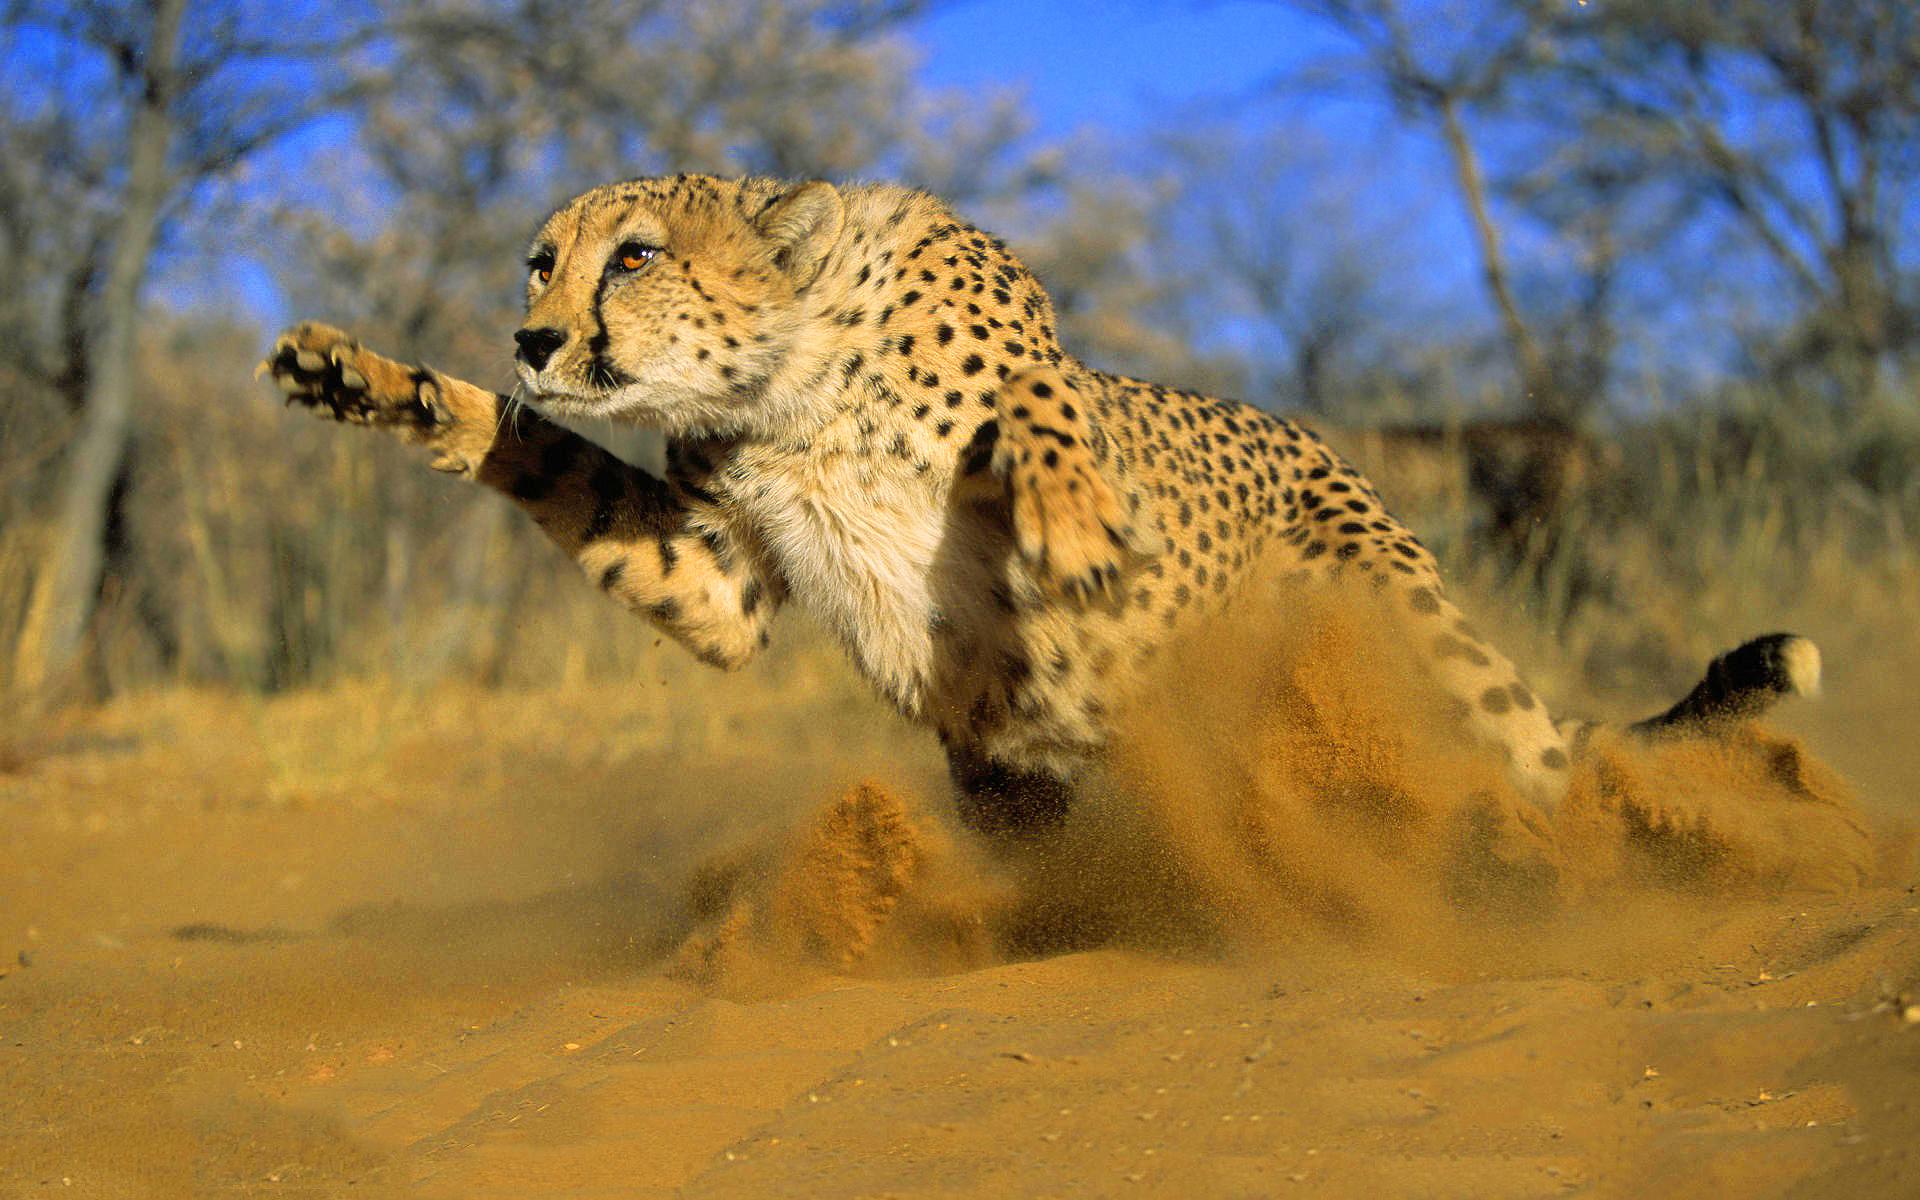 Cheetah Photos Animals Hd Wallpapers Free Download: Cheetah Running Hd - HD Desktop Wallpapers